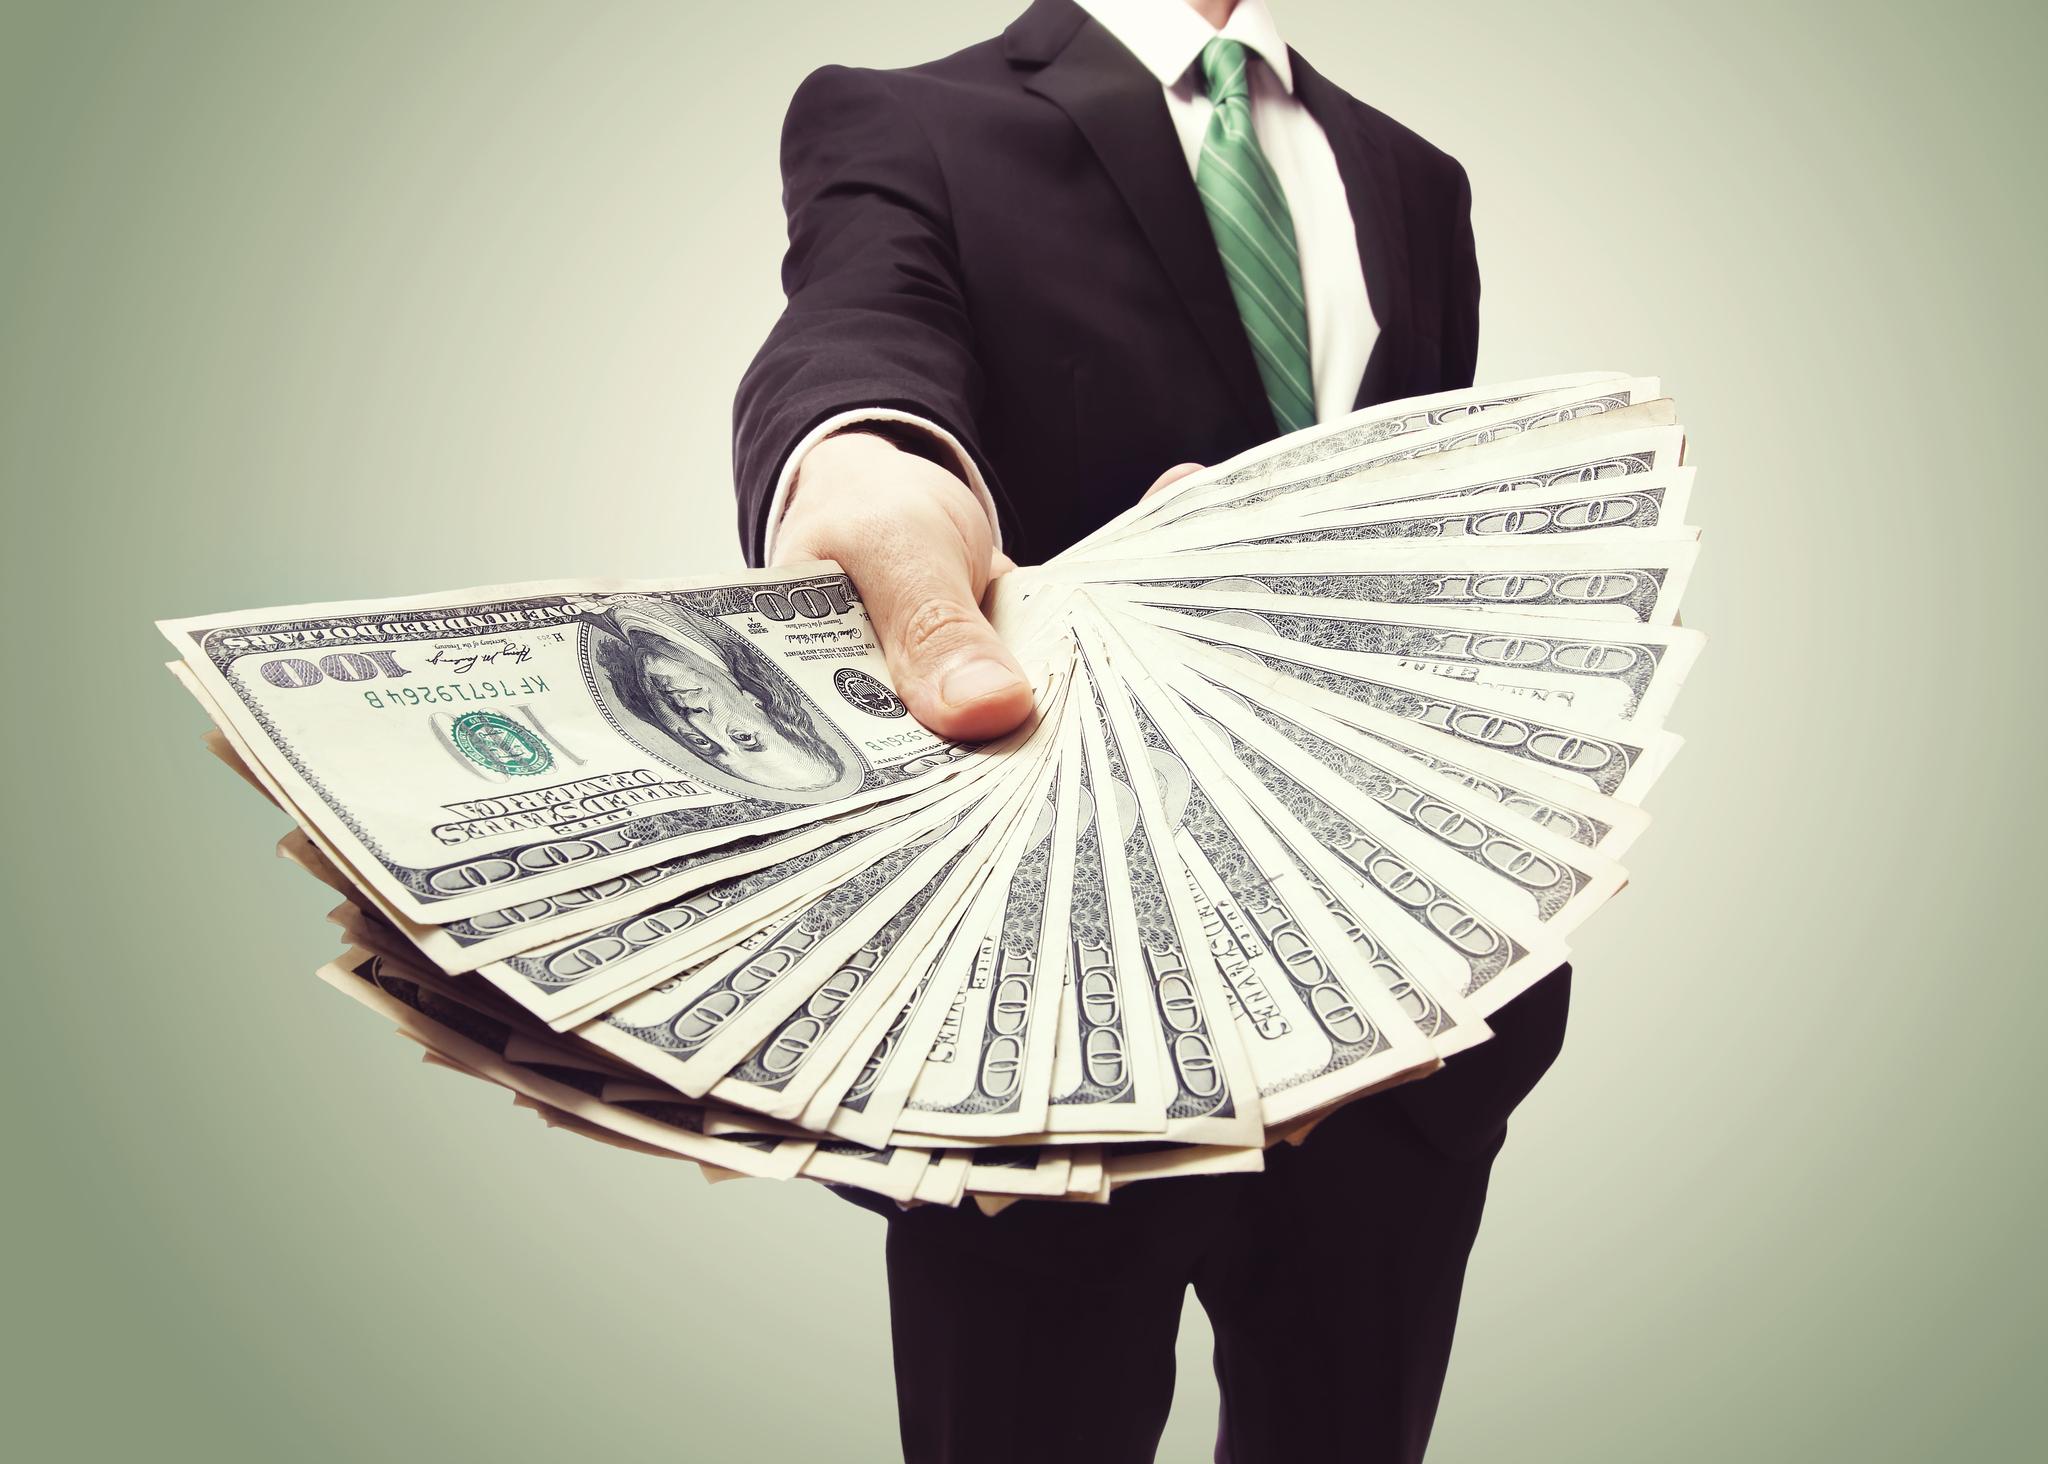 Man holding a handful of $100 bills.